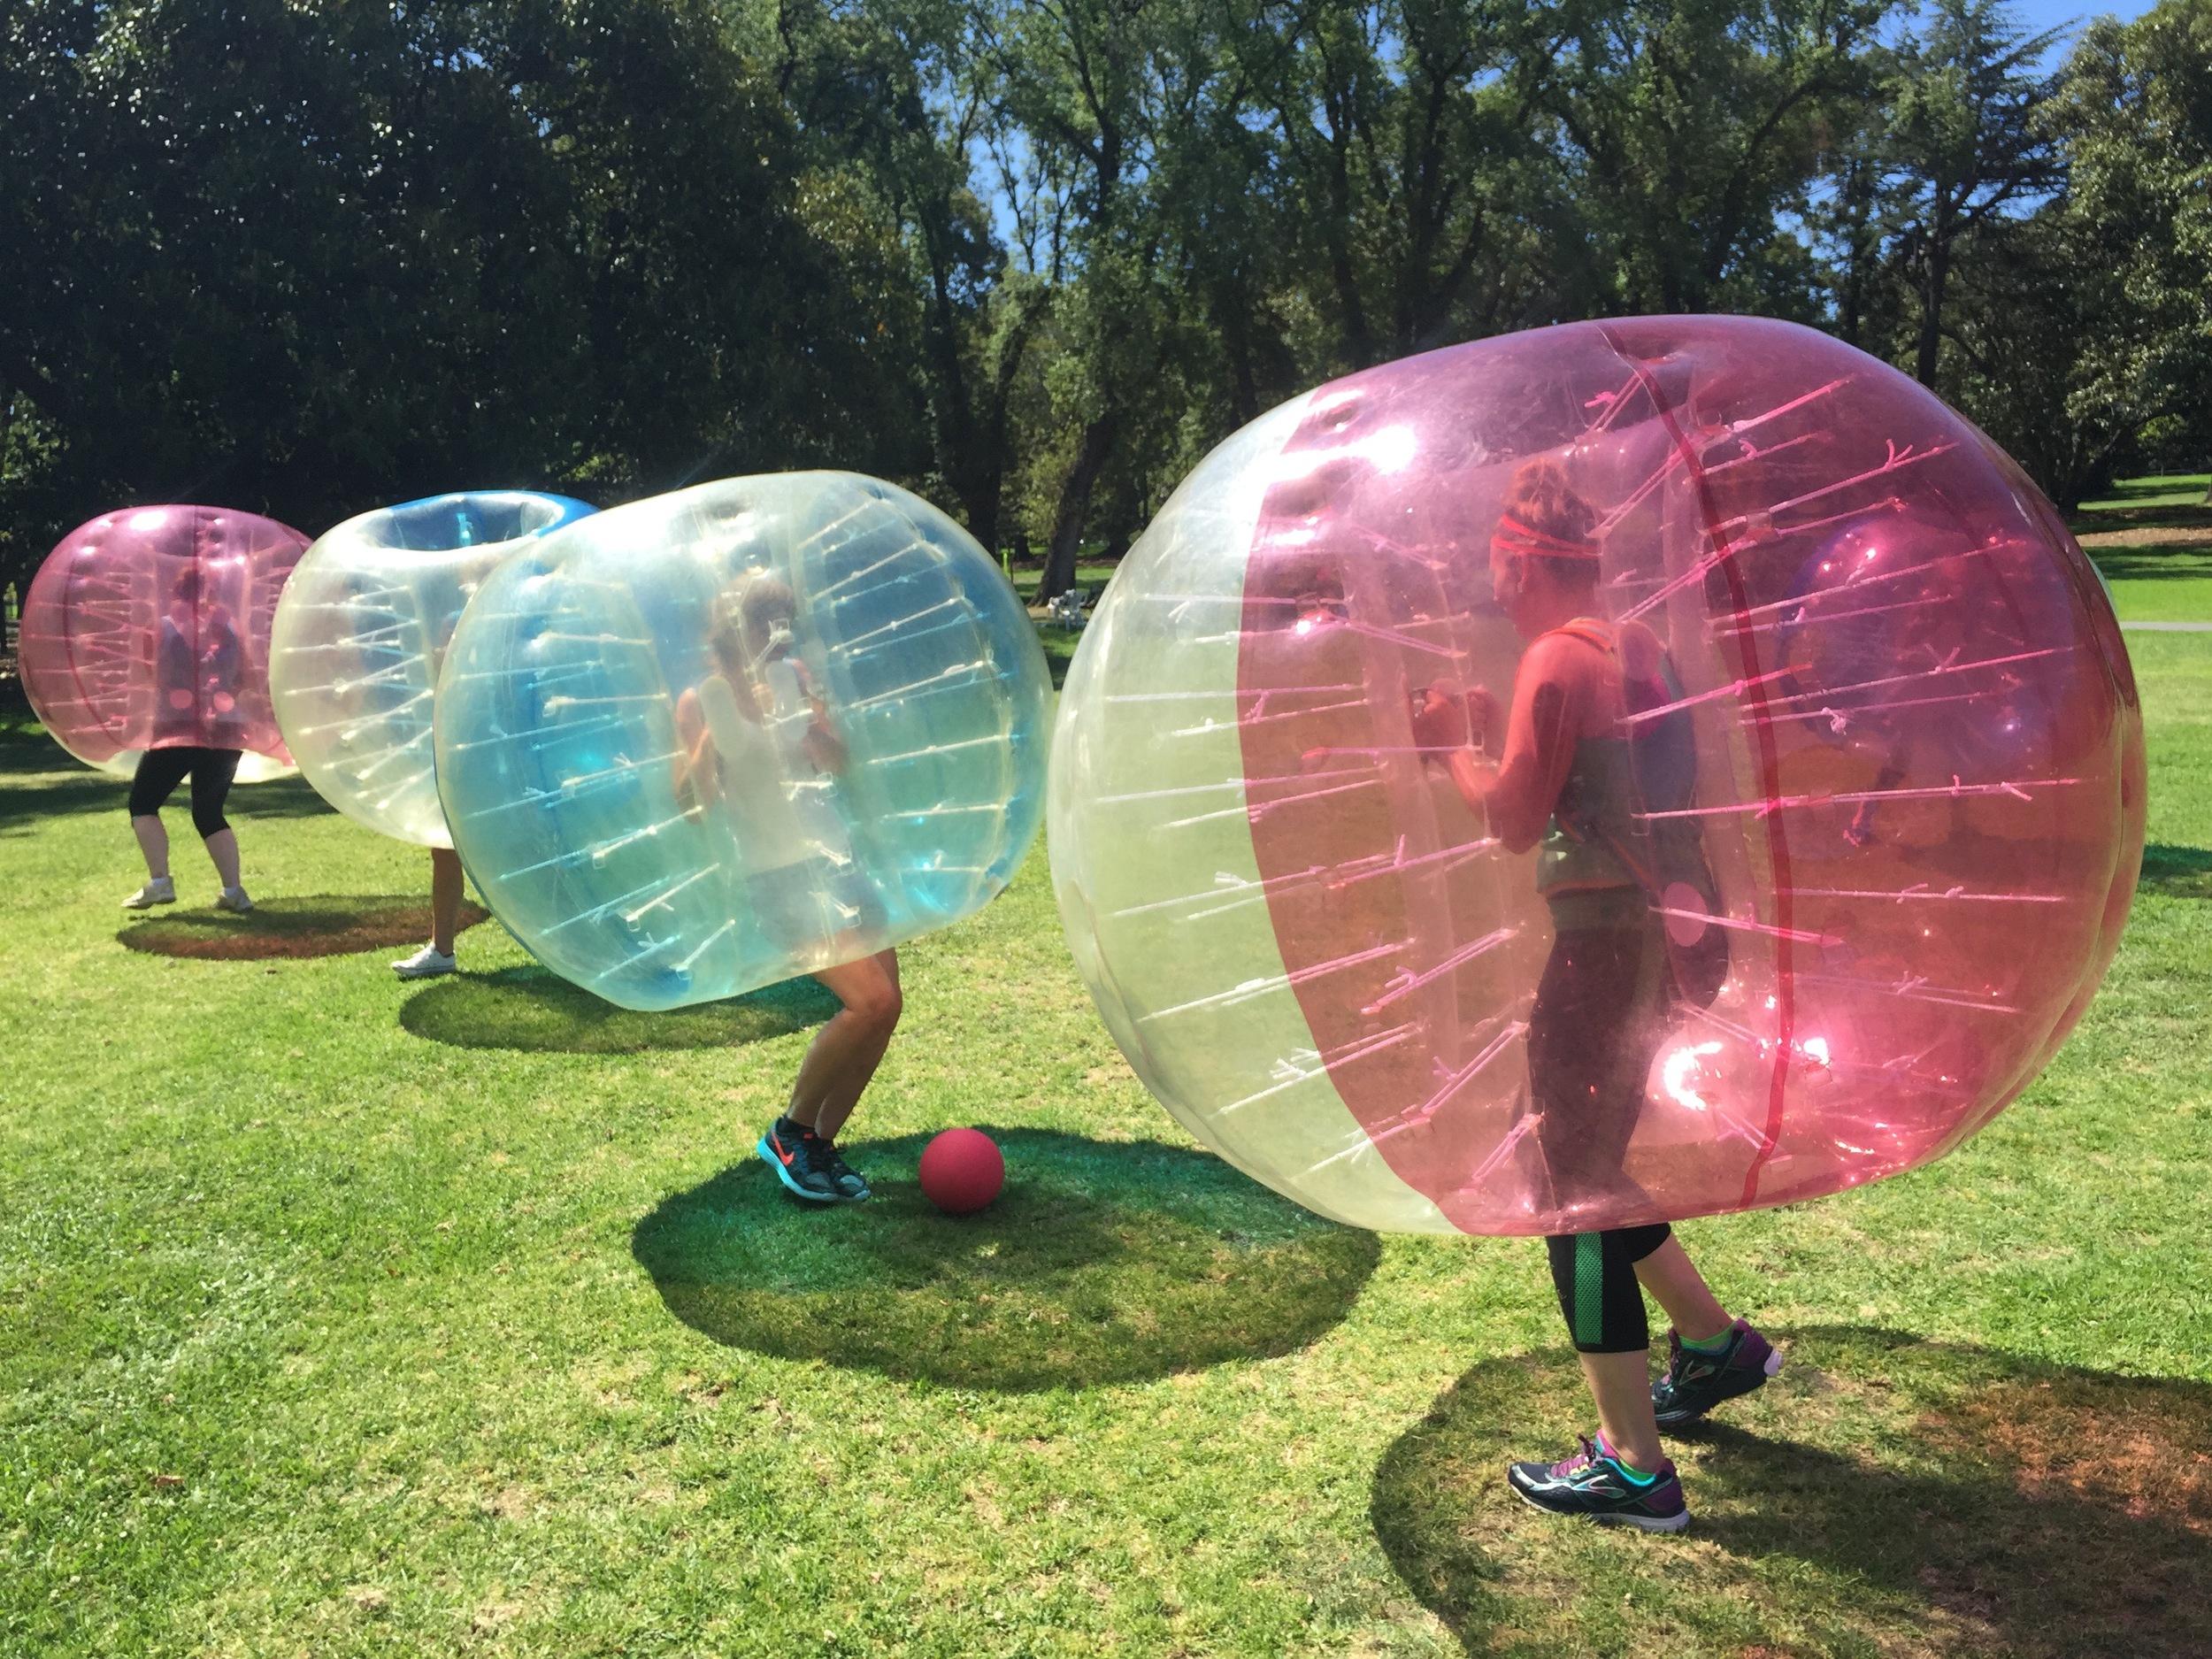 Hens_Party_Fawkner_Park_Melbourne.jpg